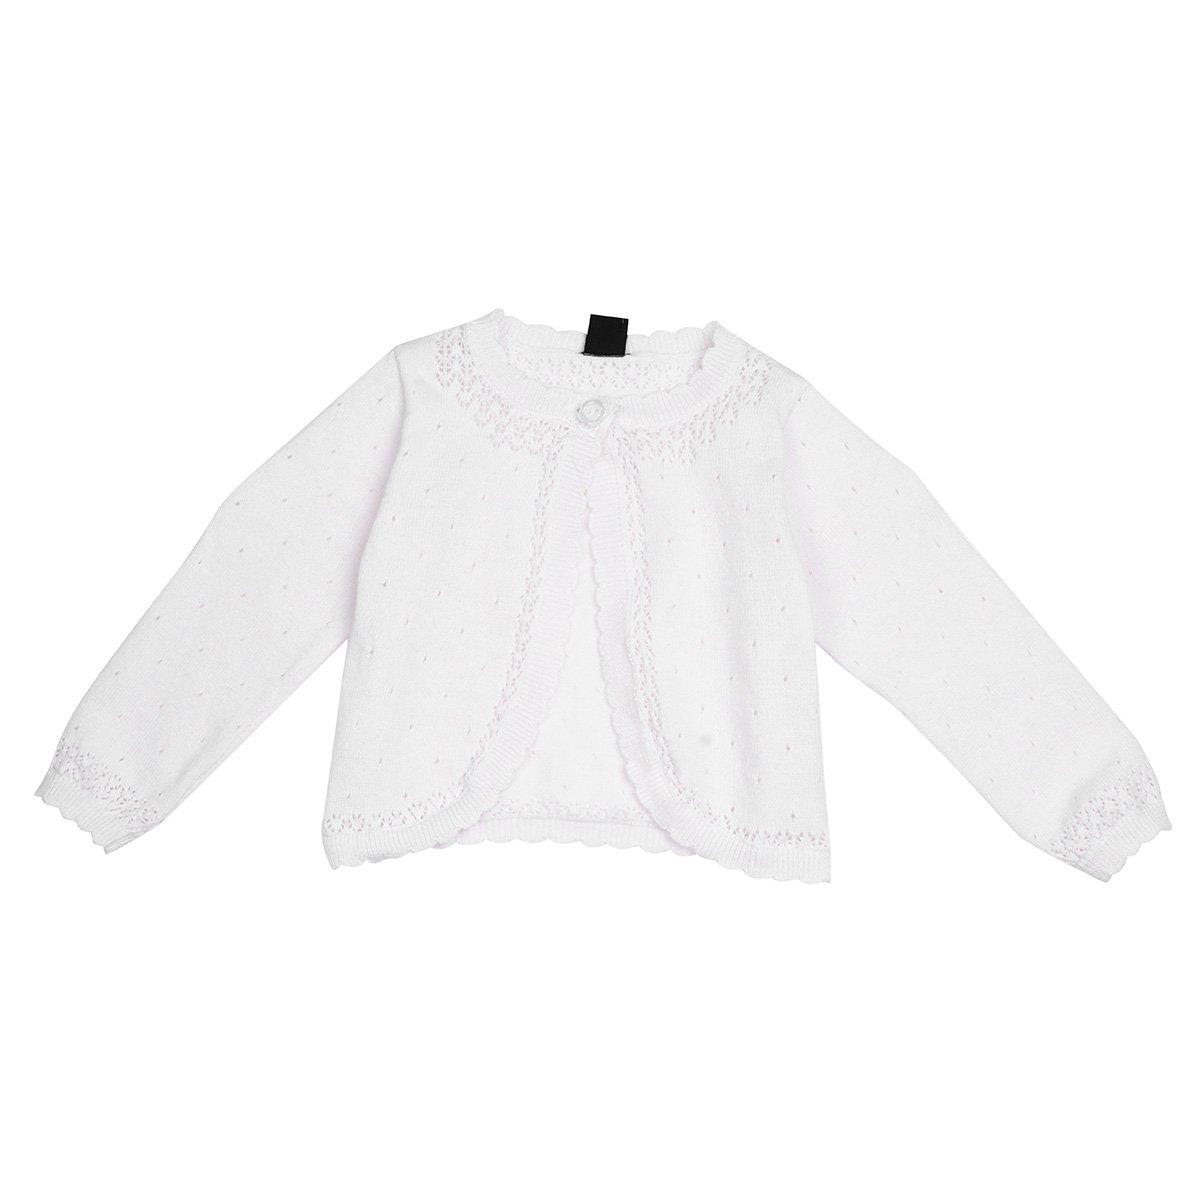 Freebily Kids Girls Long Sleeve Lace Flower Flower Bolero Jacket Shrug Short Cardigan Dress Cover Up White 12-18 Months